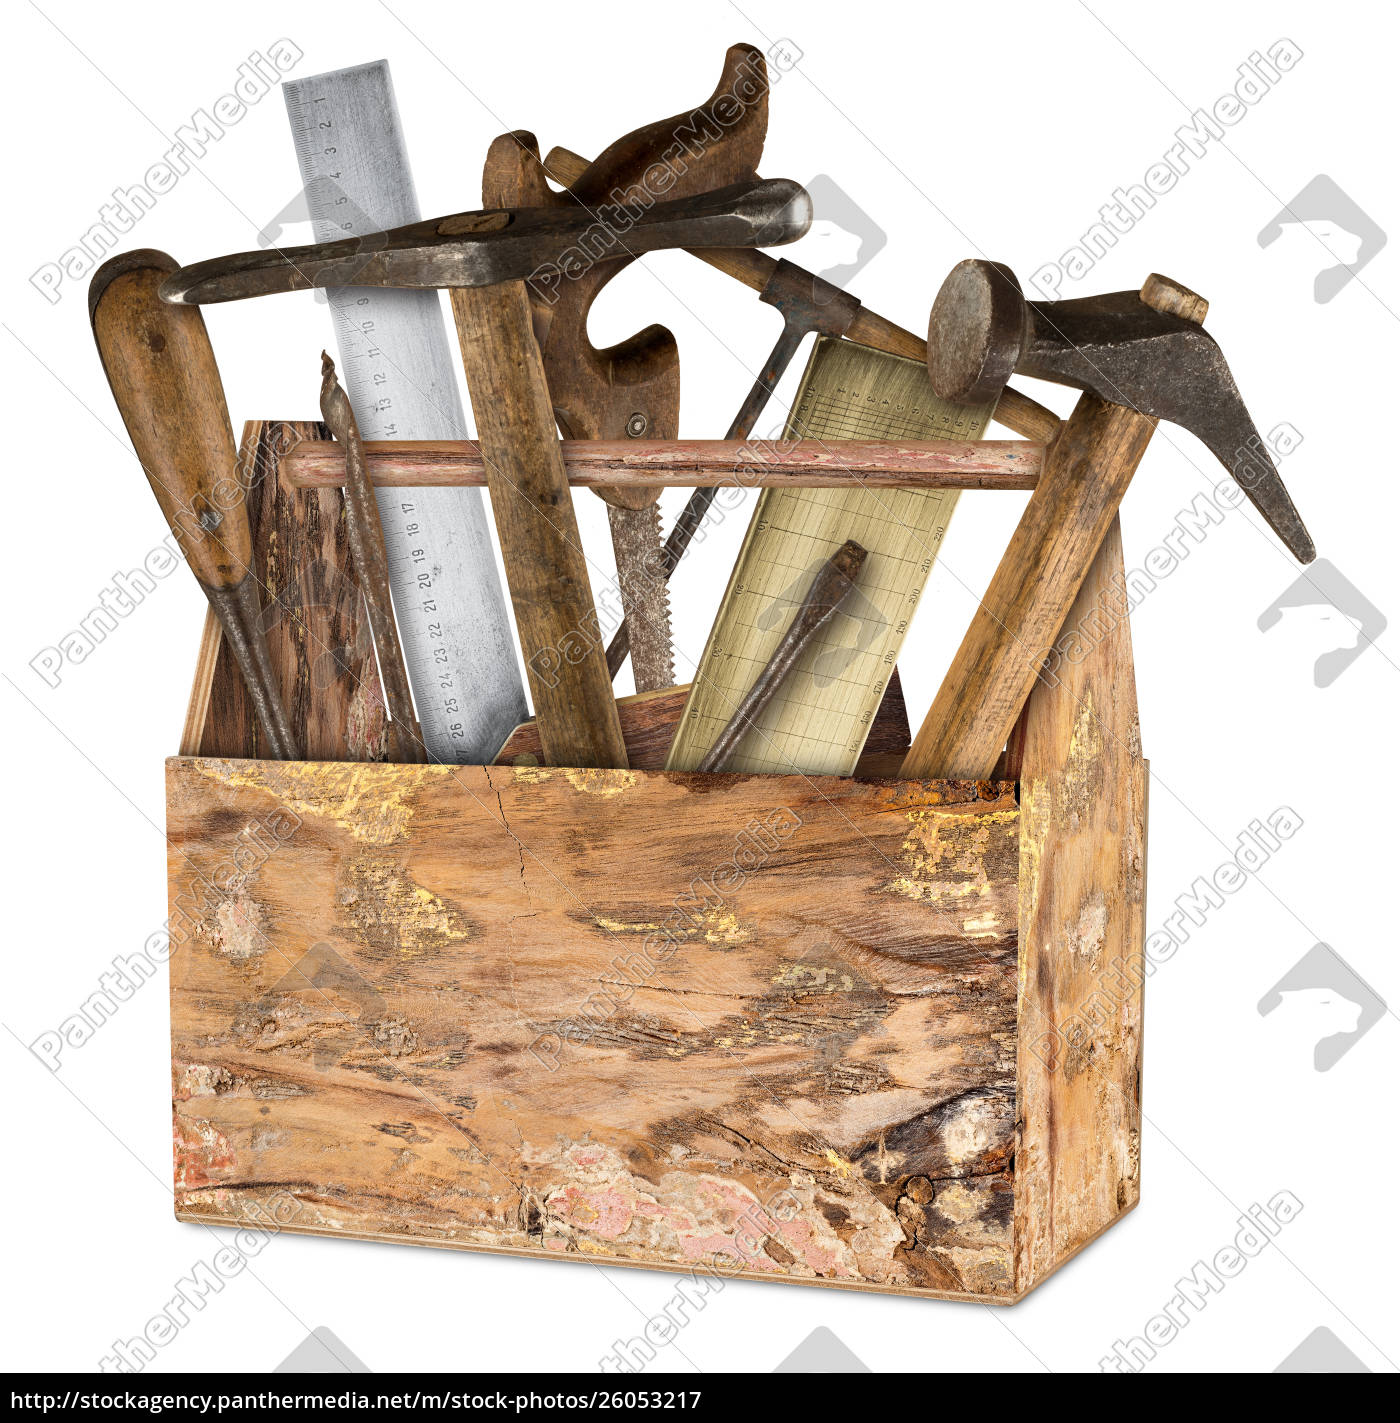 wooden, old, rustic, retro, tool, box - 26053217